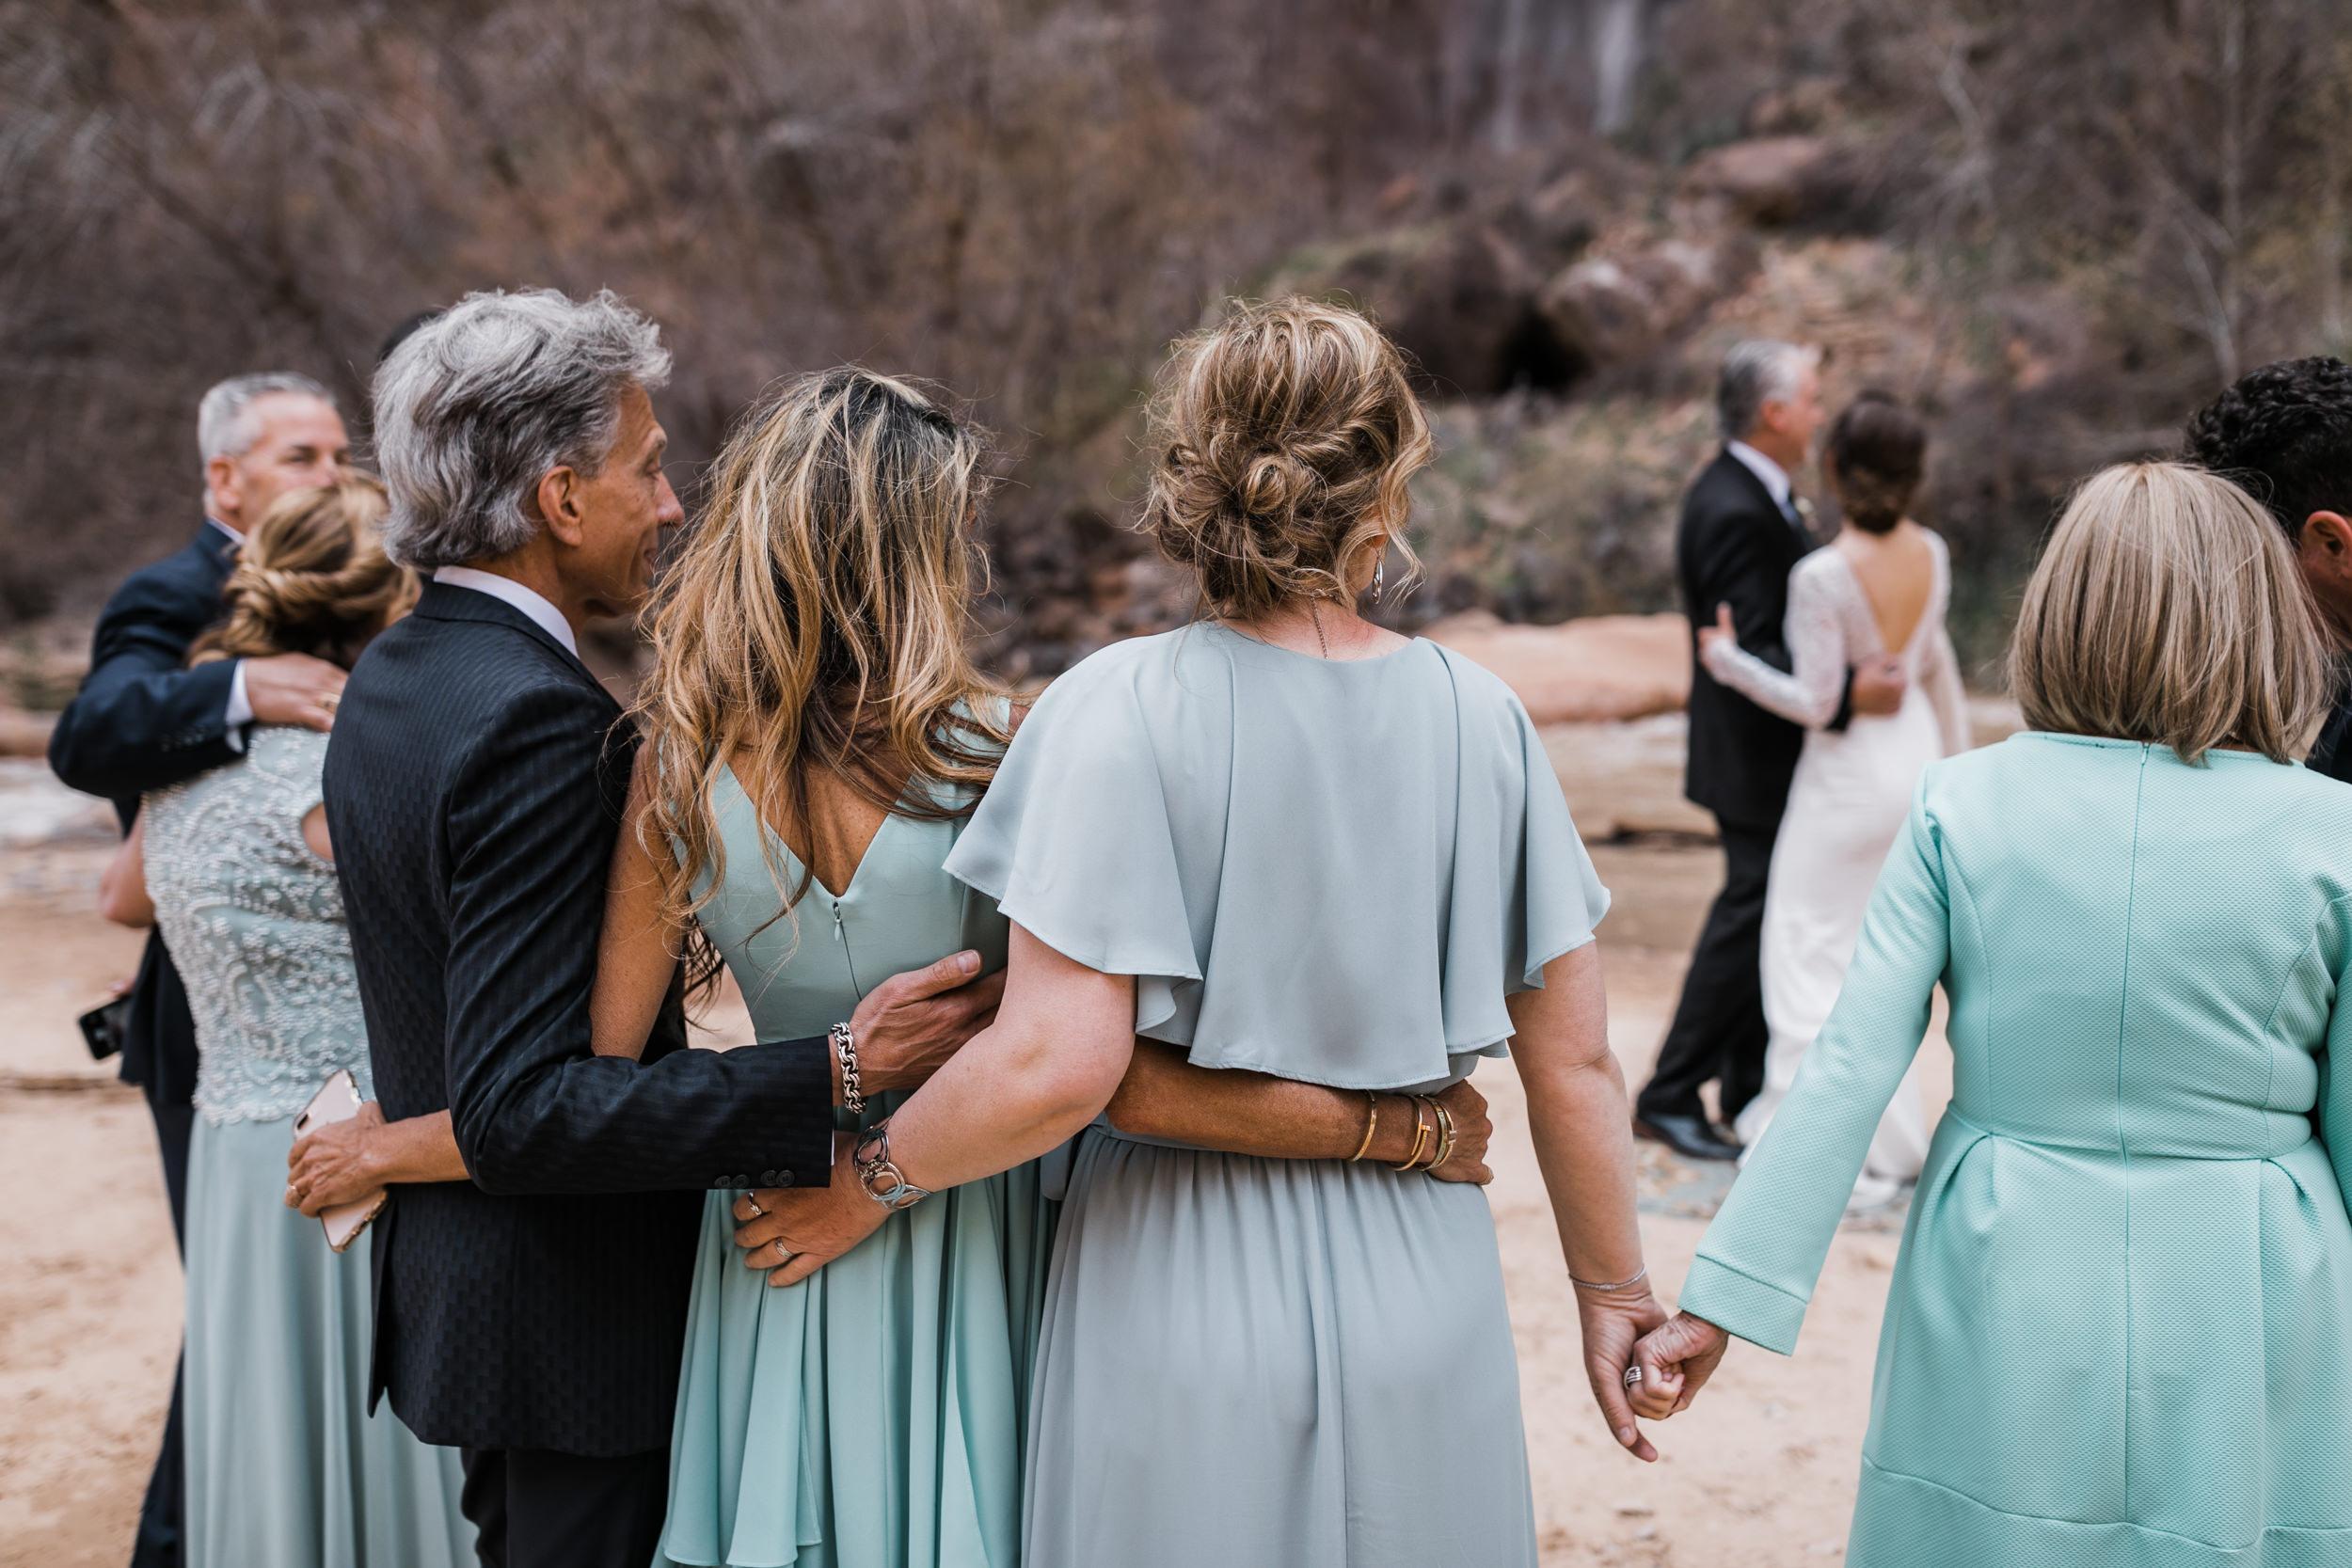 Zion-National-Park-Adventure-Wedding-Hearnes-Elopement-Photography-19.jpg